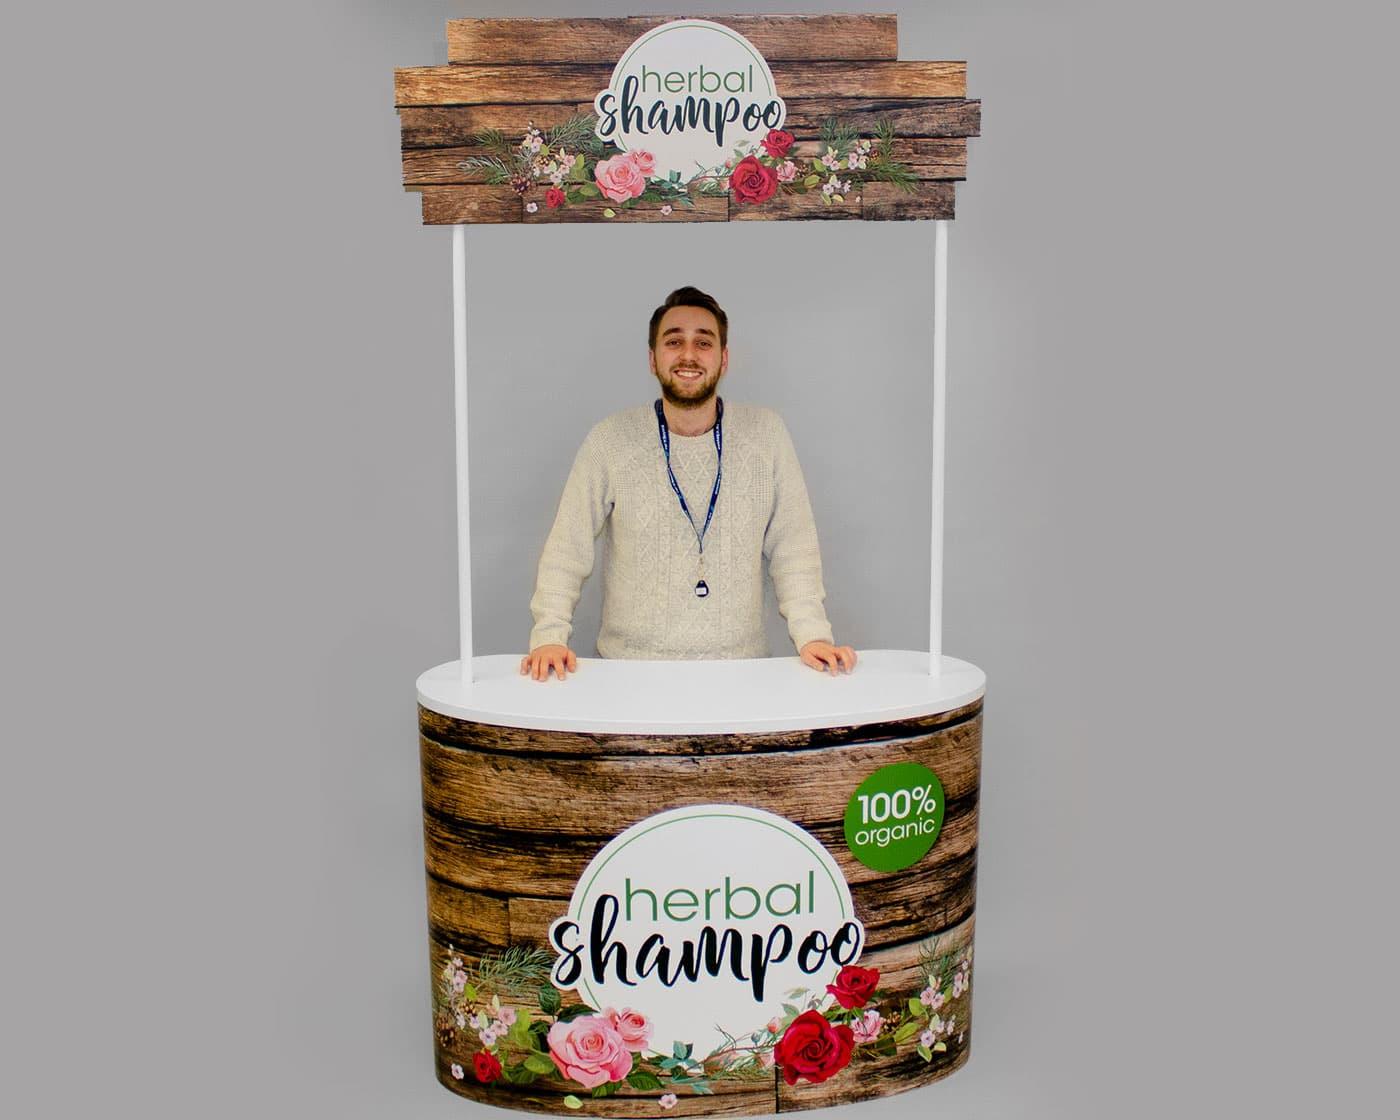 Herbal-Shampoo-2